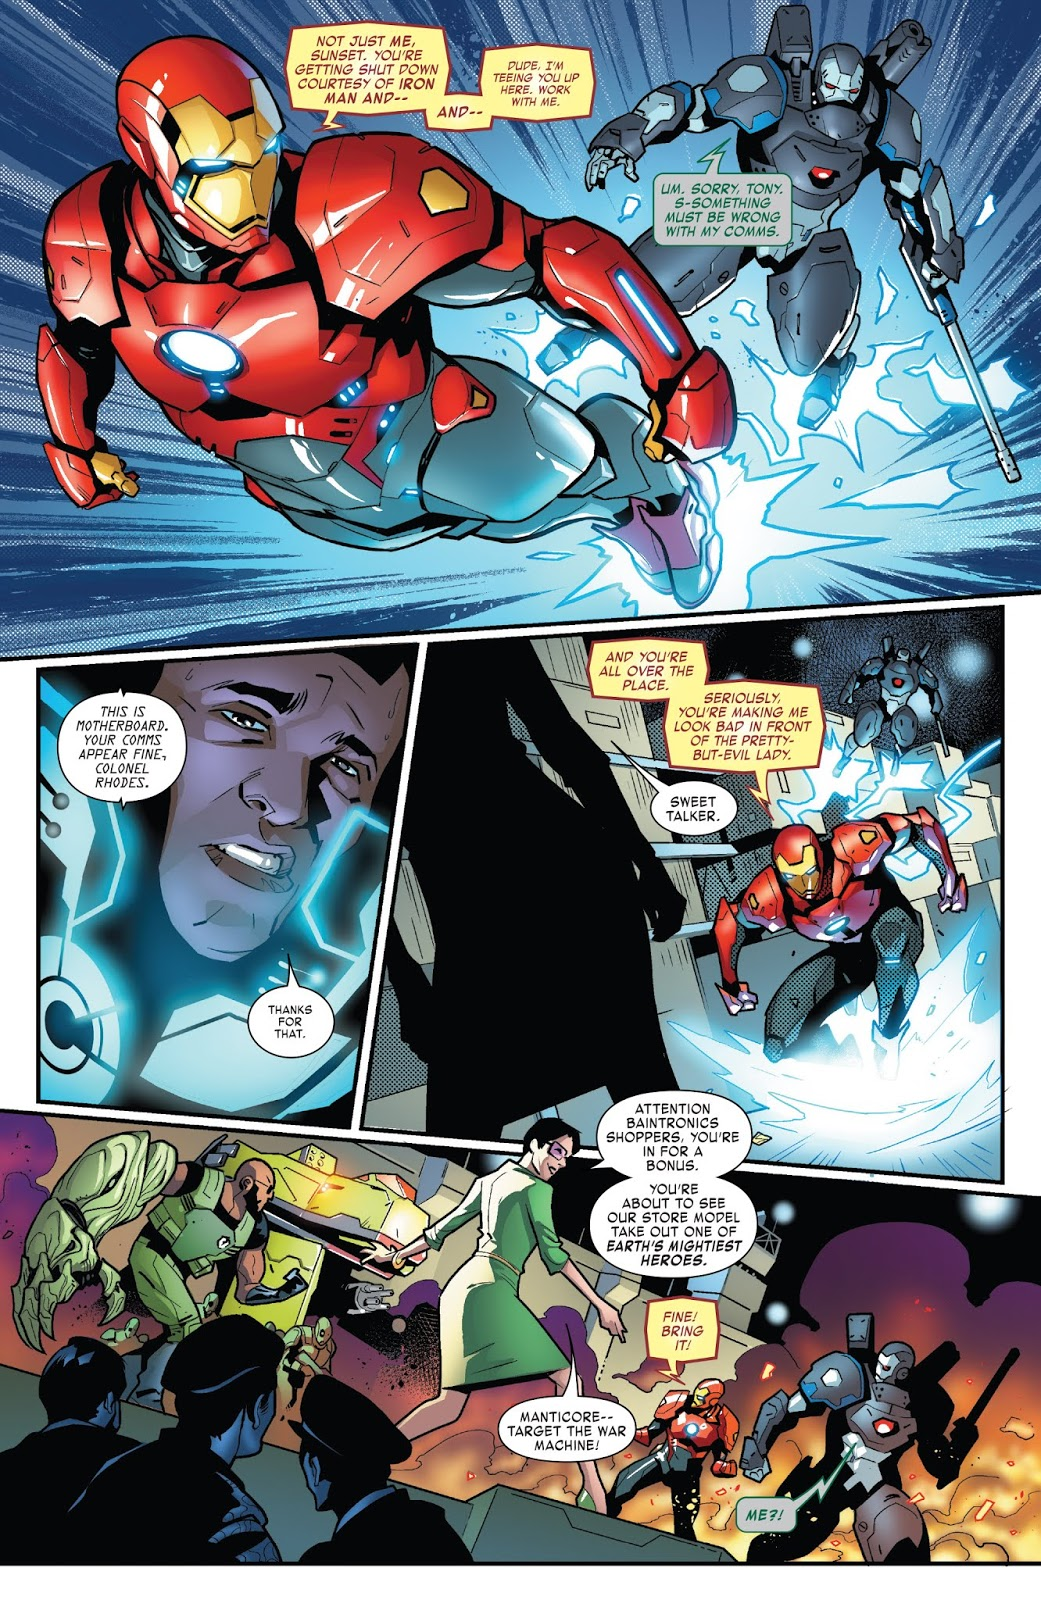 Tony Stark Iron Man Self-Made Man review